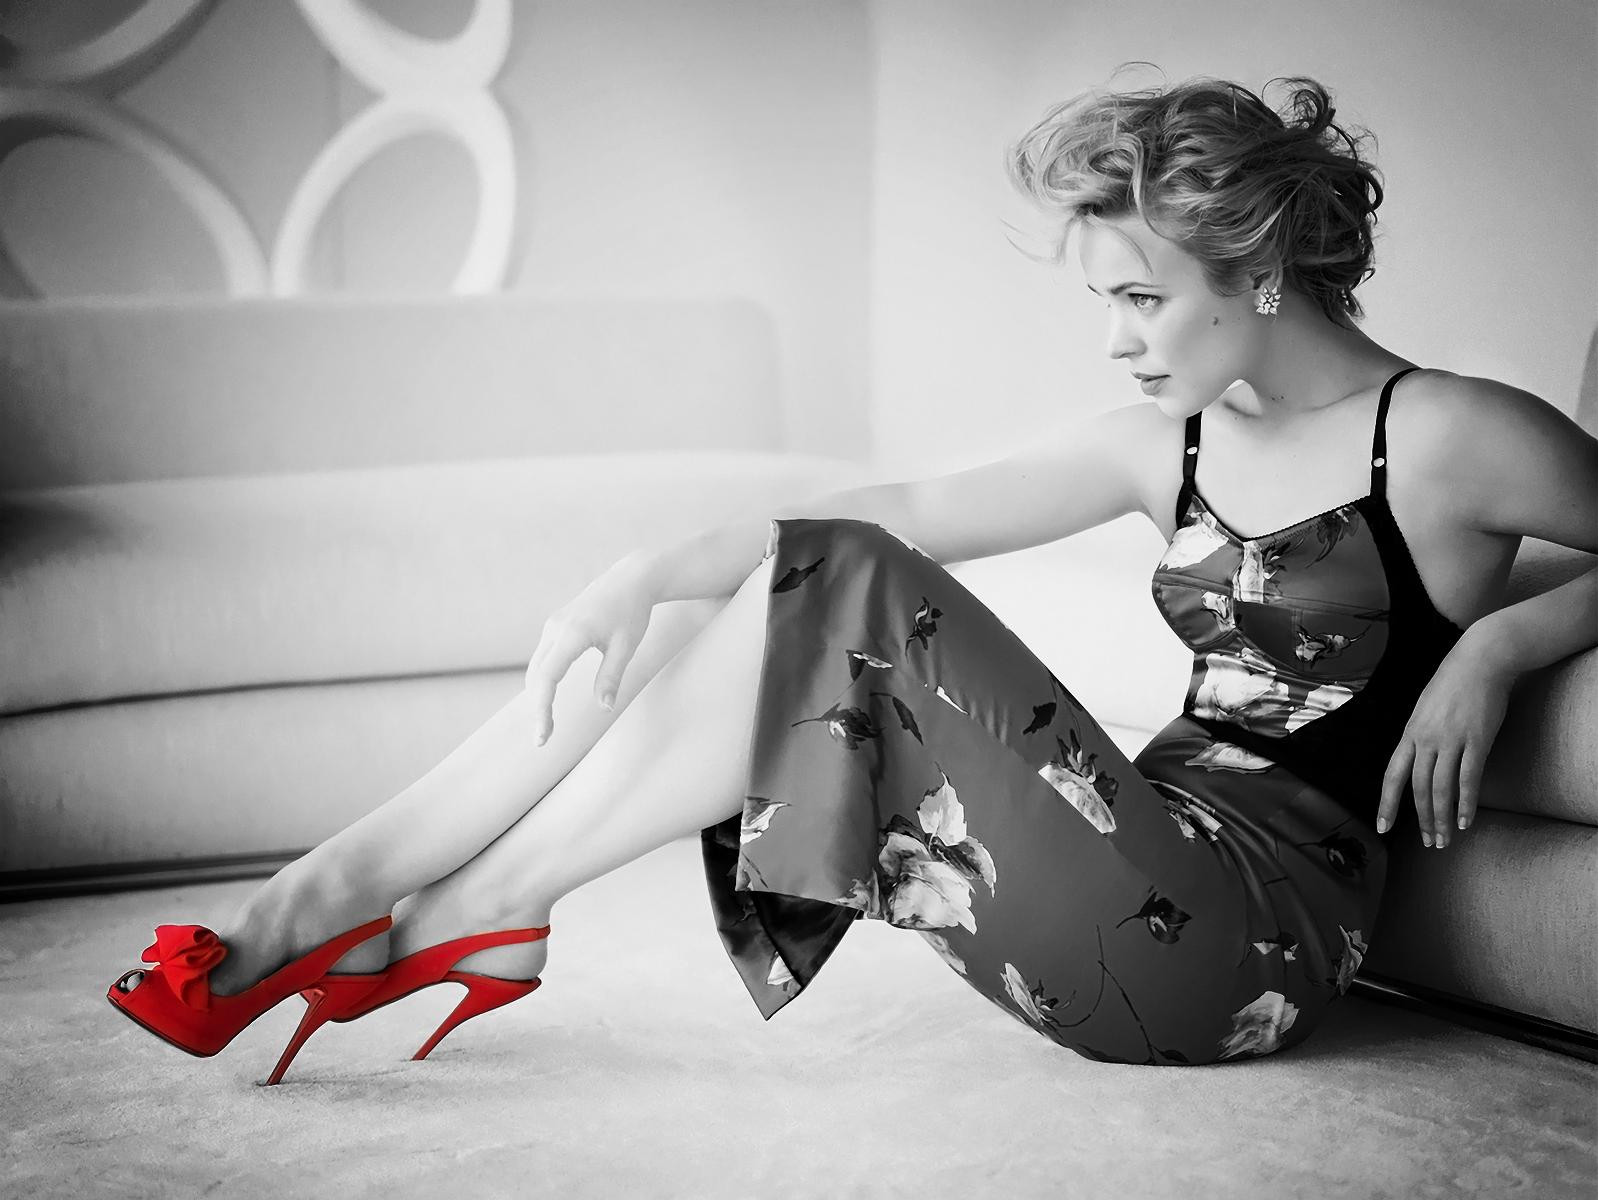 http://2.bp.blogspot.com/-cdv_SNMDrjs/USjexqasDJI/AAAAAAAAEIQ/JKgH38BYpOU/s1600/racheal-mcadams-red-+heels-inkbluesky.png